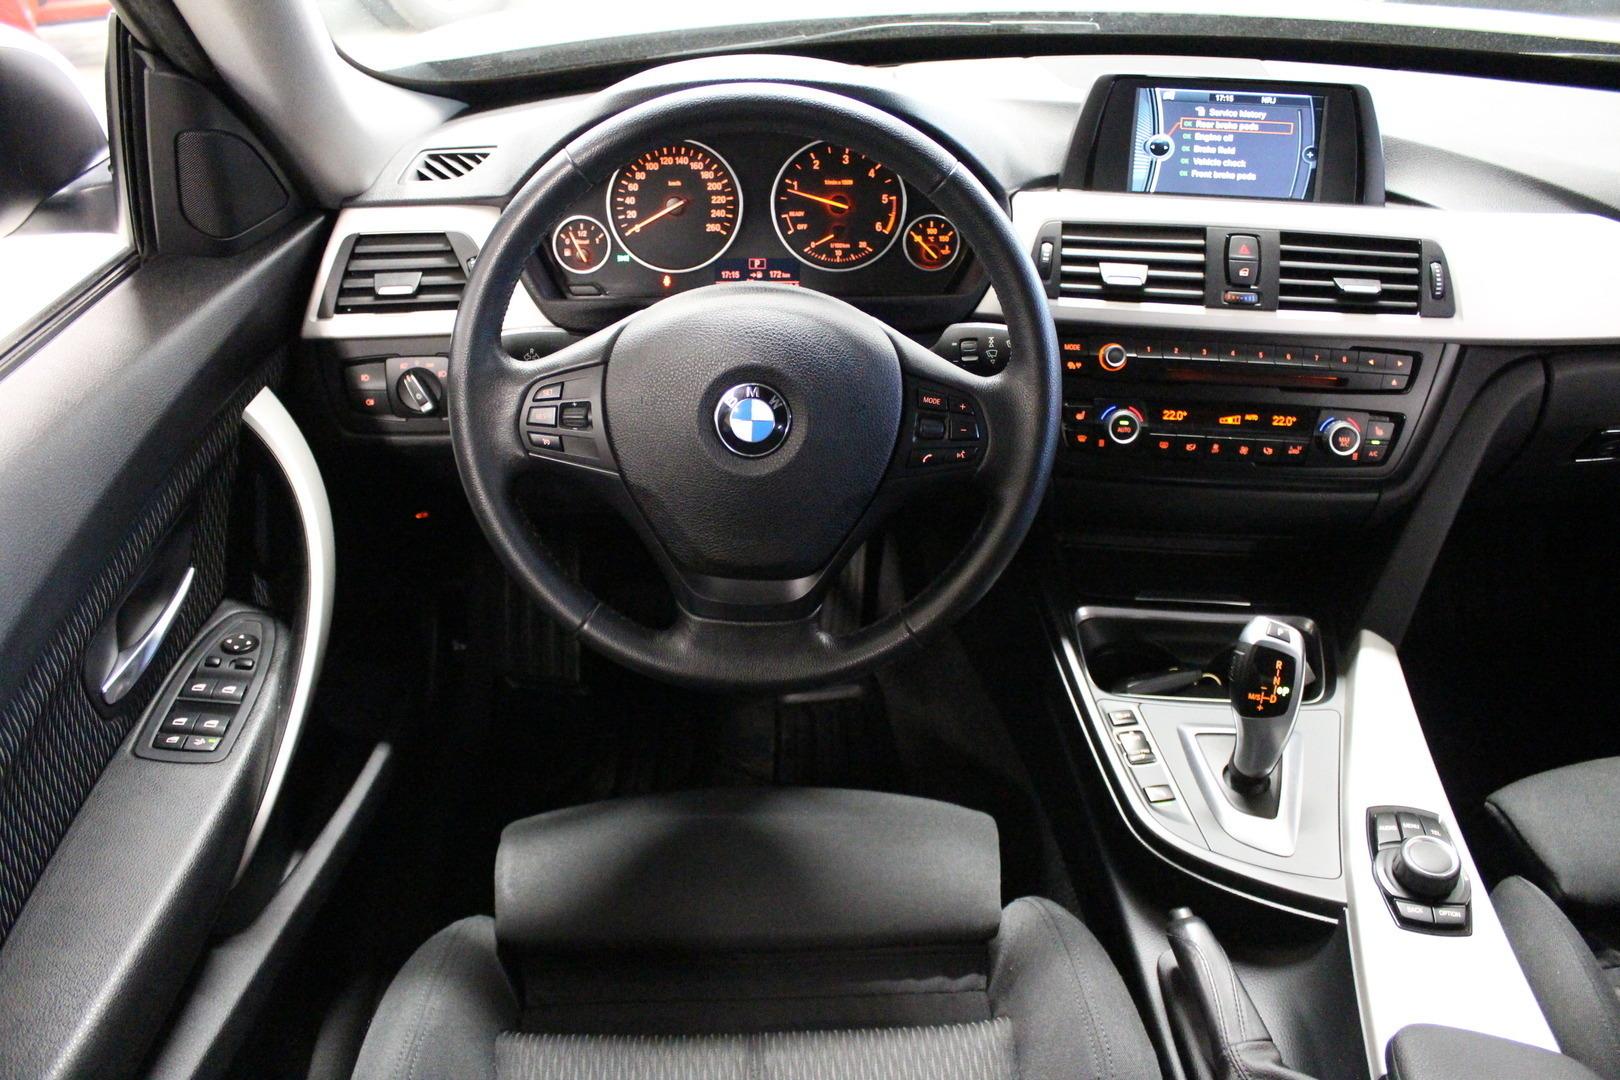 BMW 320, F34 Gran Turismo 320d TwinPower xDrive #Huippuhieno **Juuri tullut** #Suomi-auto #Sporttipenkit